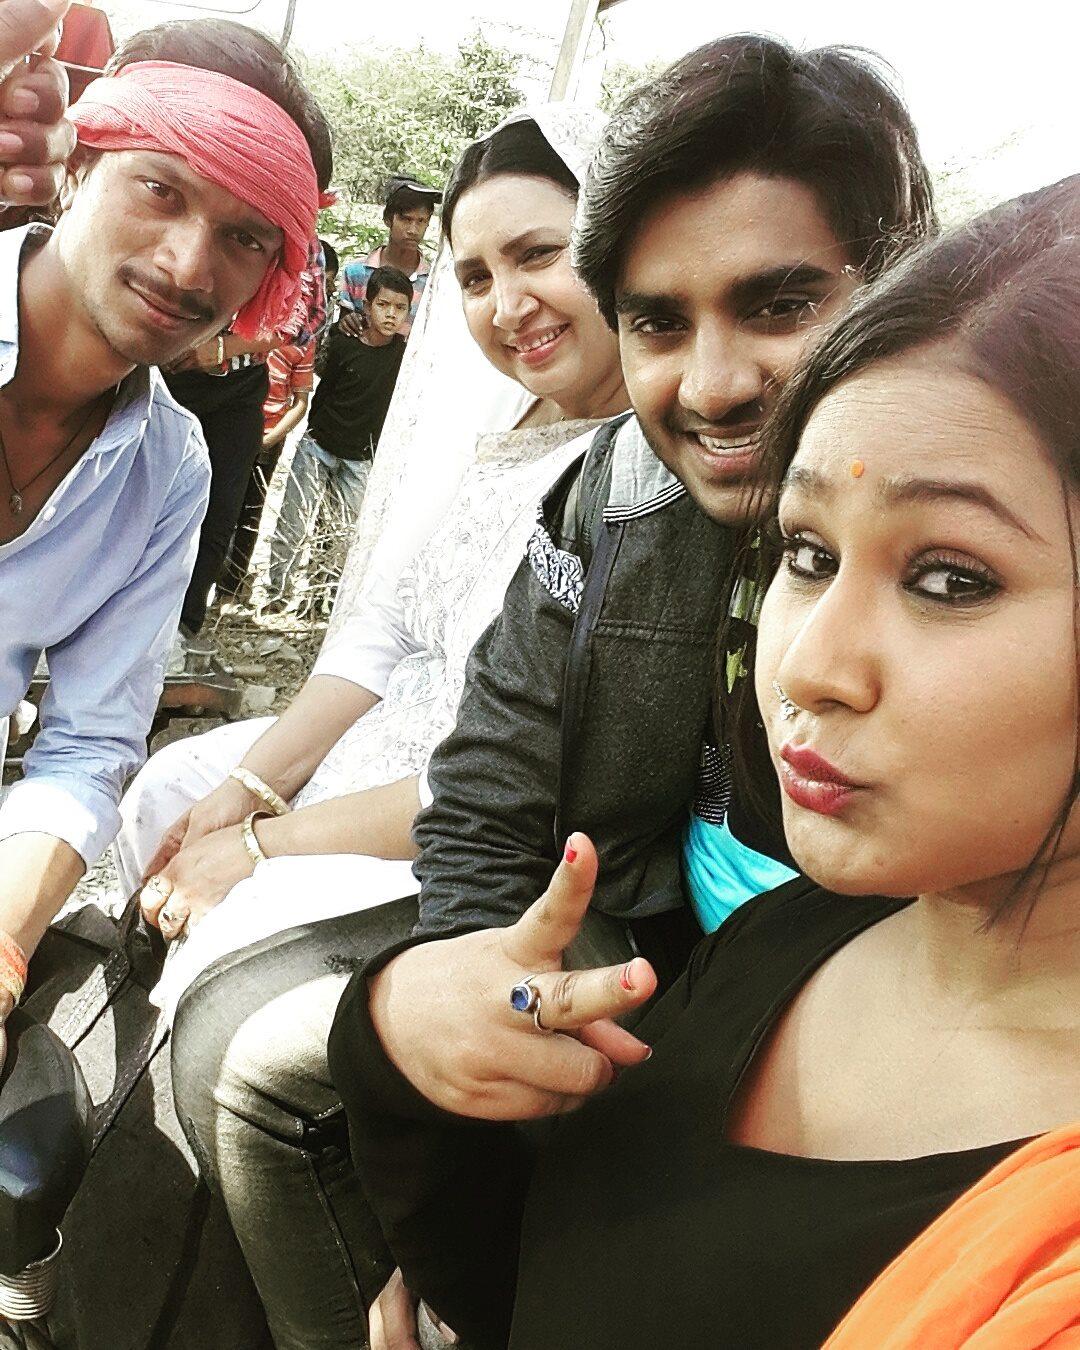 Pradeep Pandey 'Chintu', Priyanka Pandit Shooting stills of Bhojpuri Movie Deewane